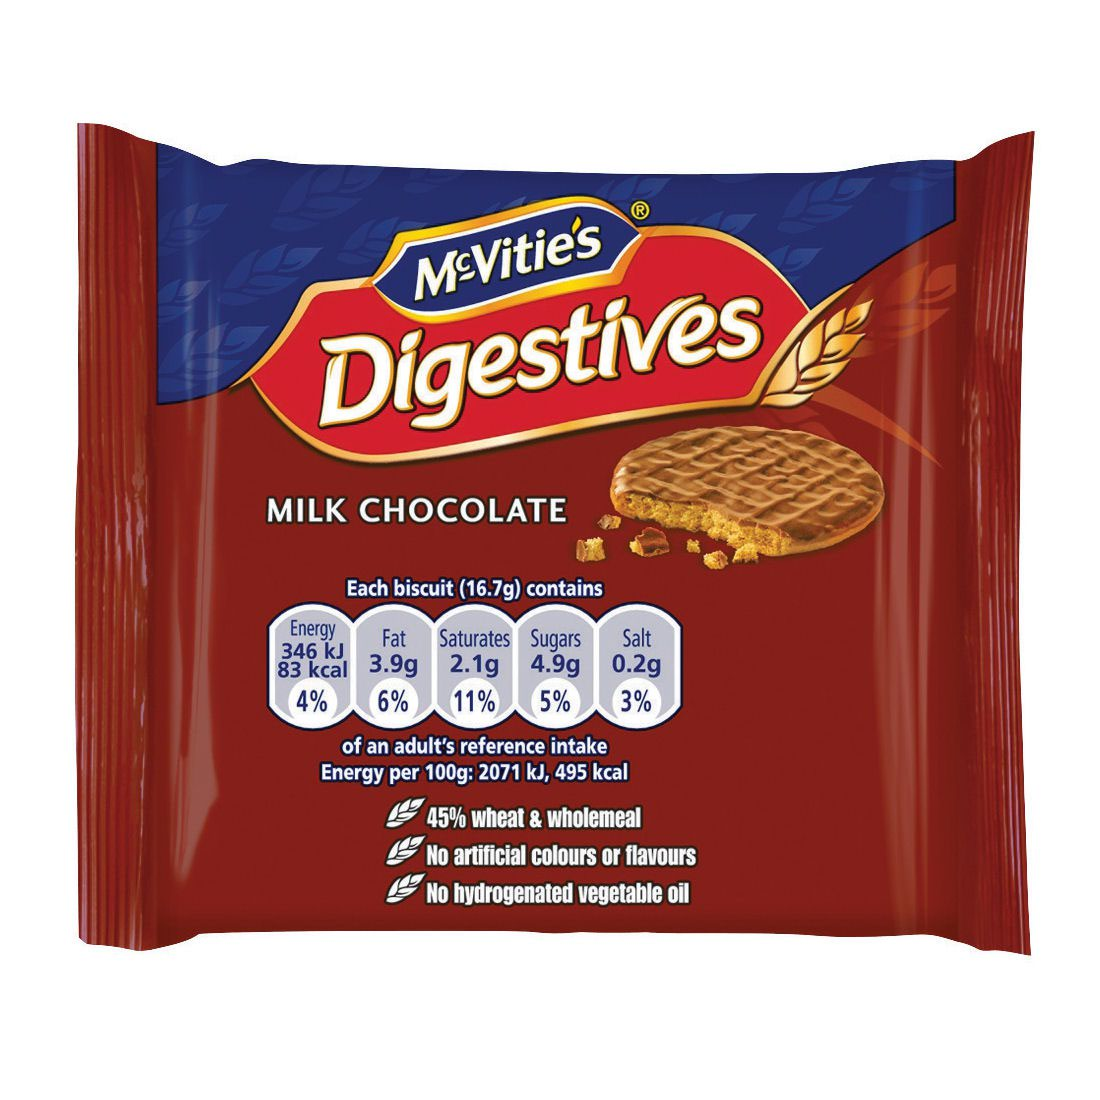 McVities Milk Chocolate Digestives Biscuits Twinpack Ref 0401066 [Pack 48]